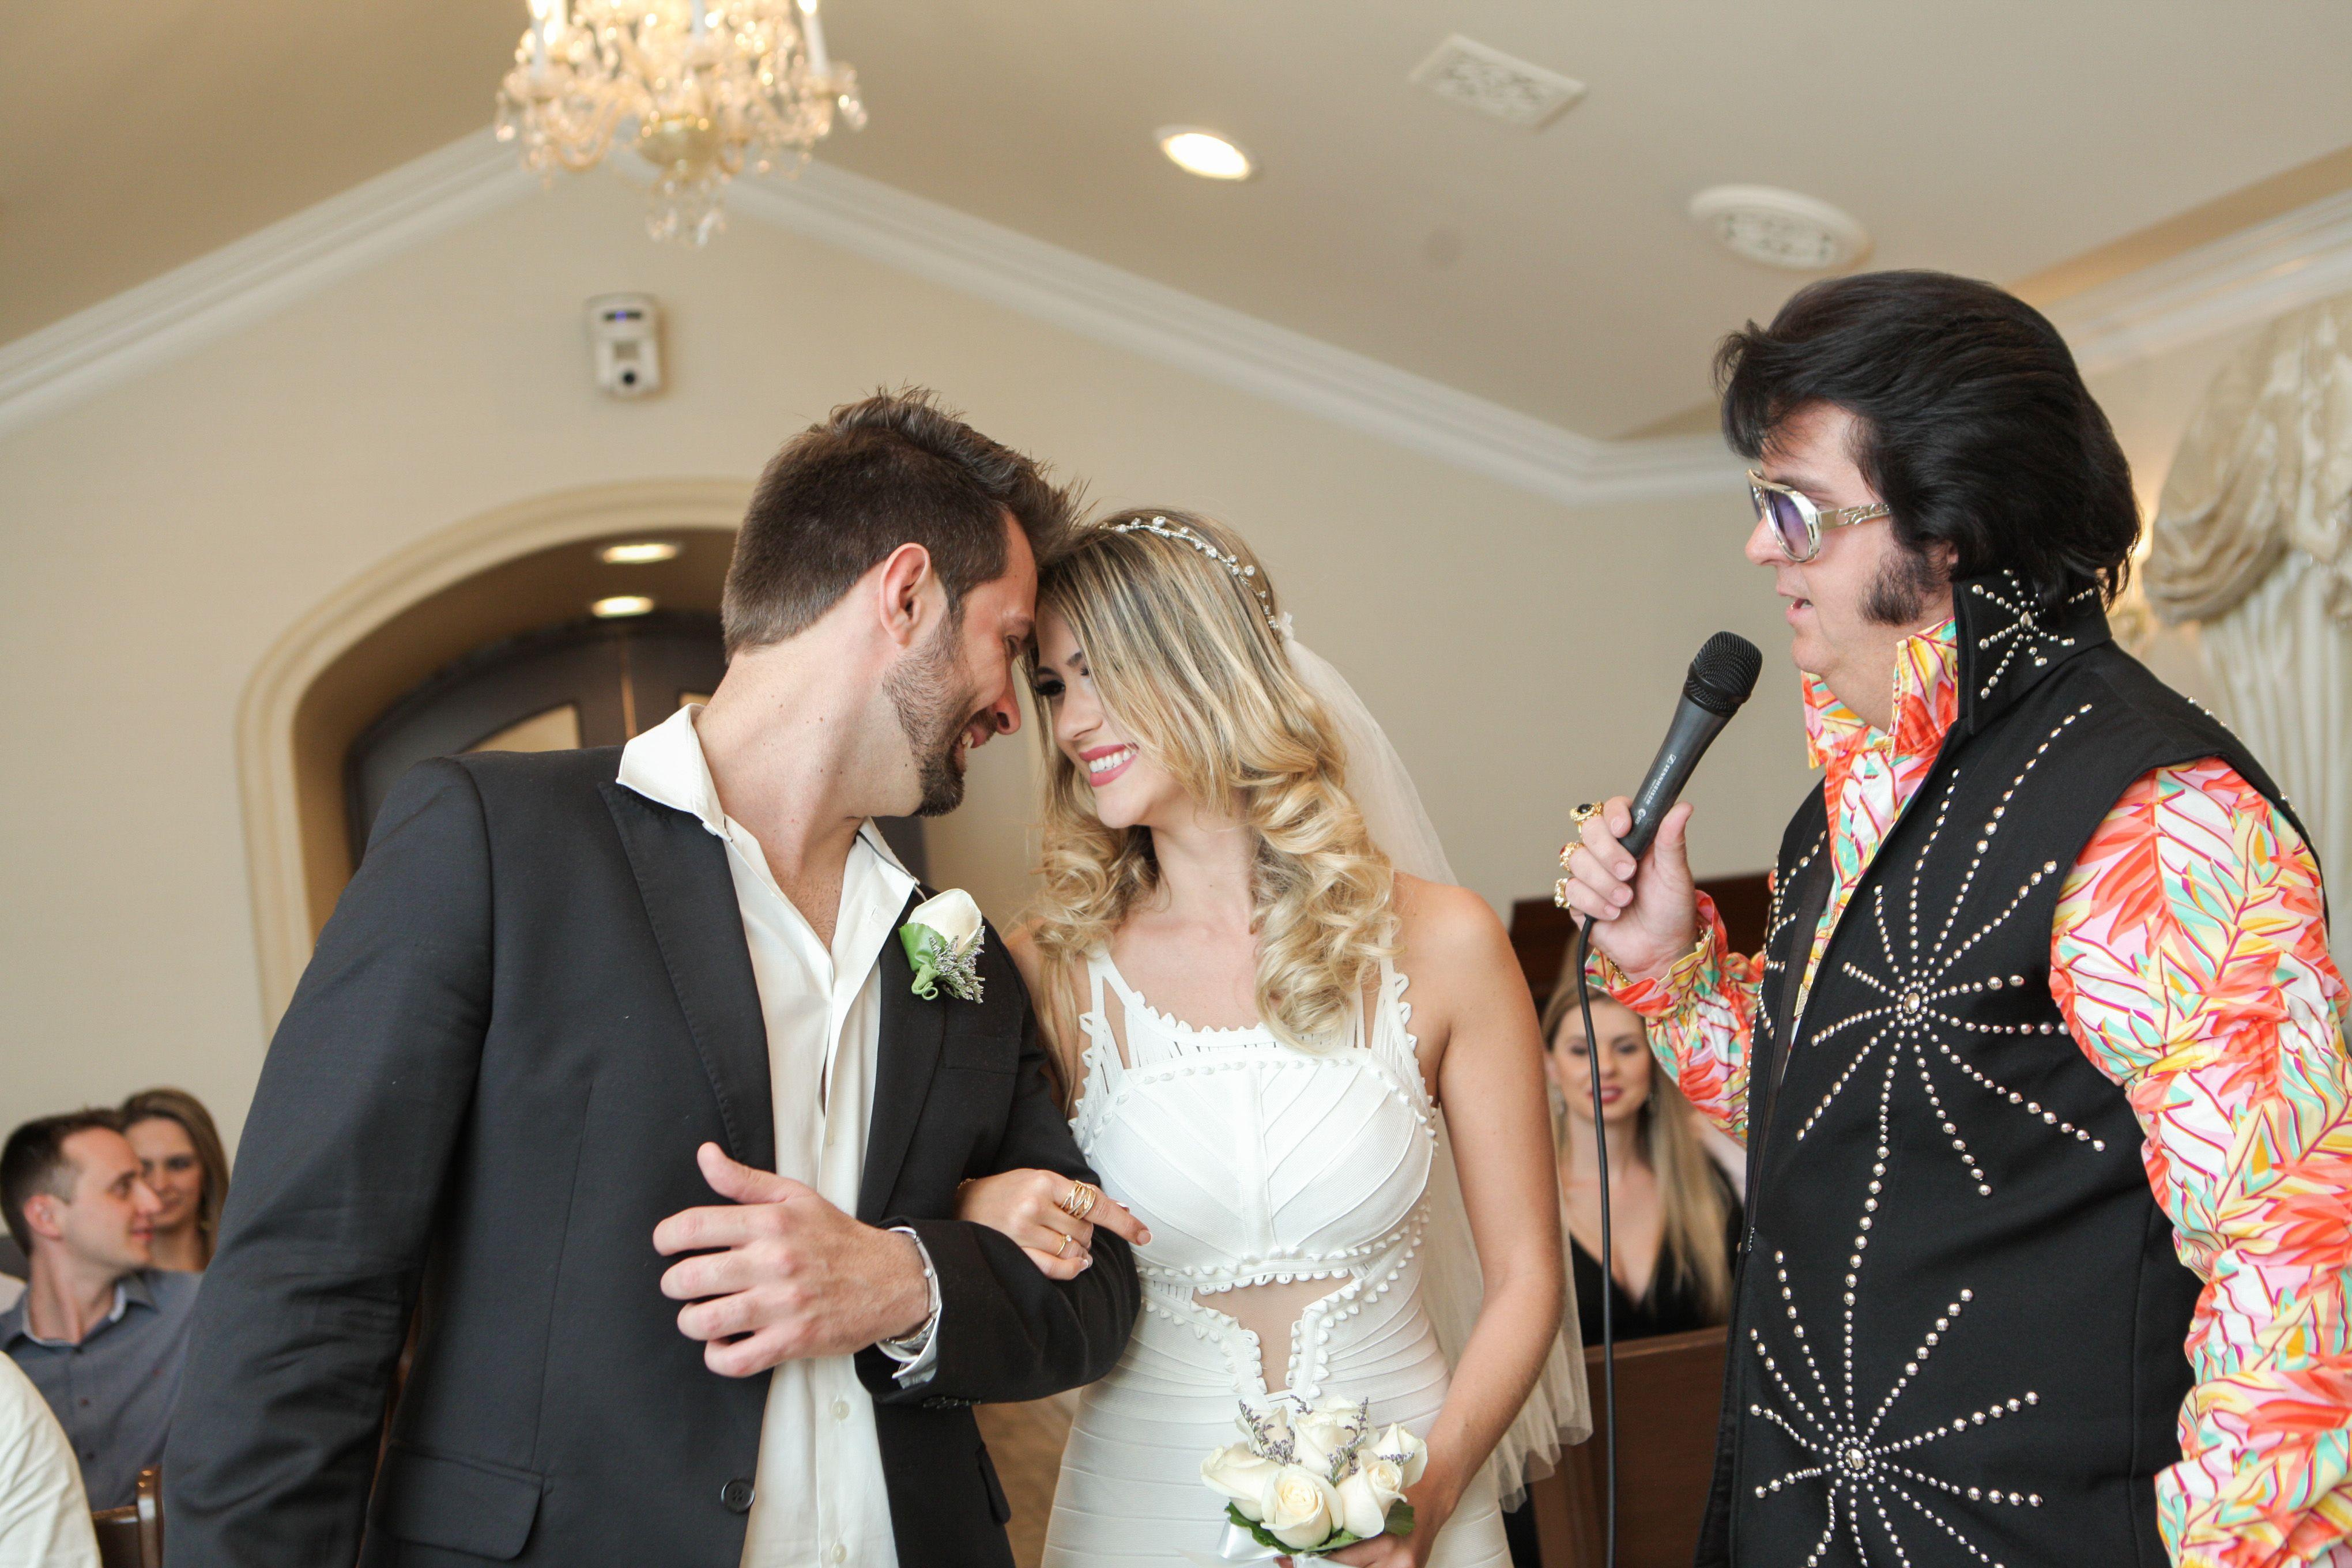 Elvis Weddings In Las Vegas All Inclusive Wedding Packages By Chapel Of The Flowers